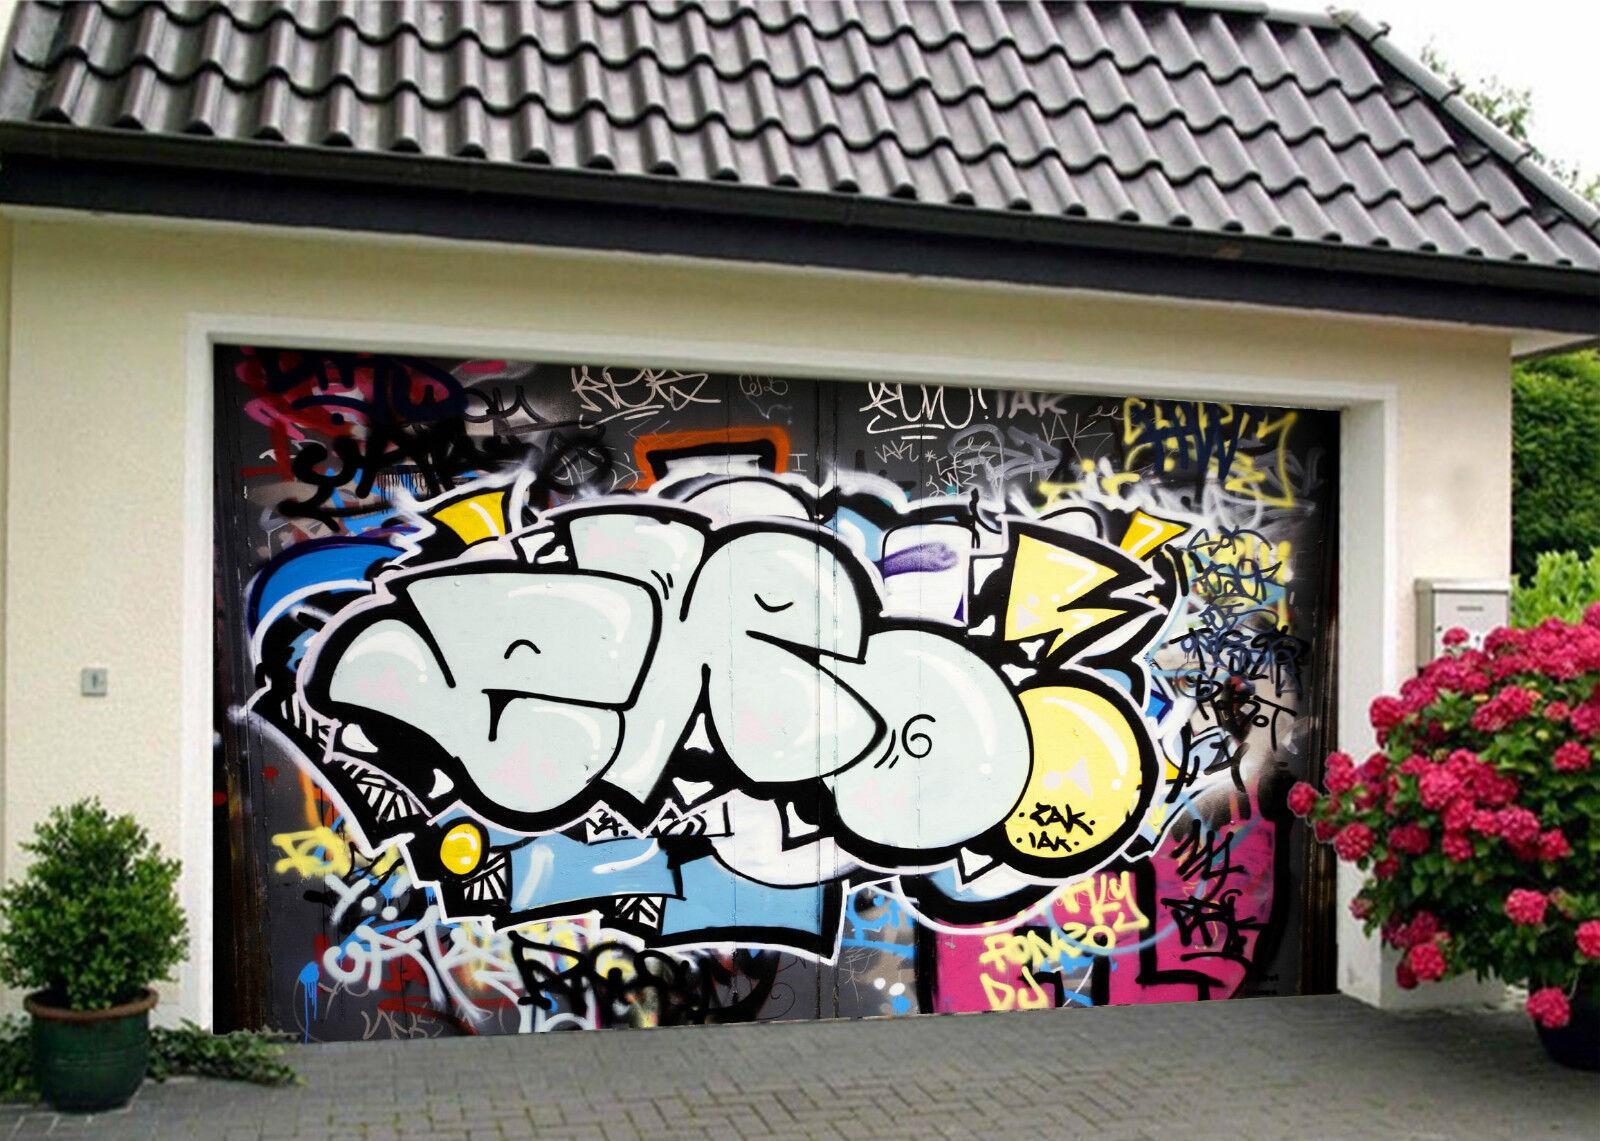 3D Graffiti 541 Garage Porta Stampe Parete Decorazione Murale AJ WALLPAPER IT